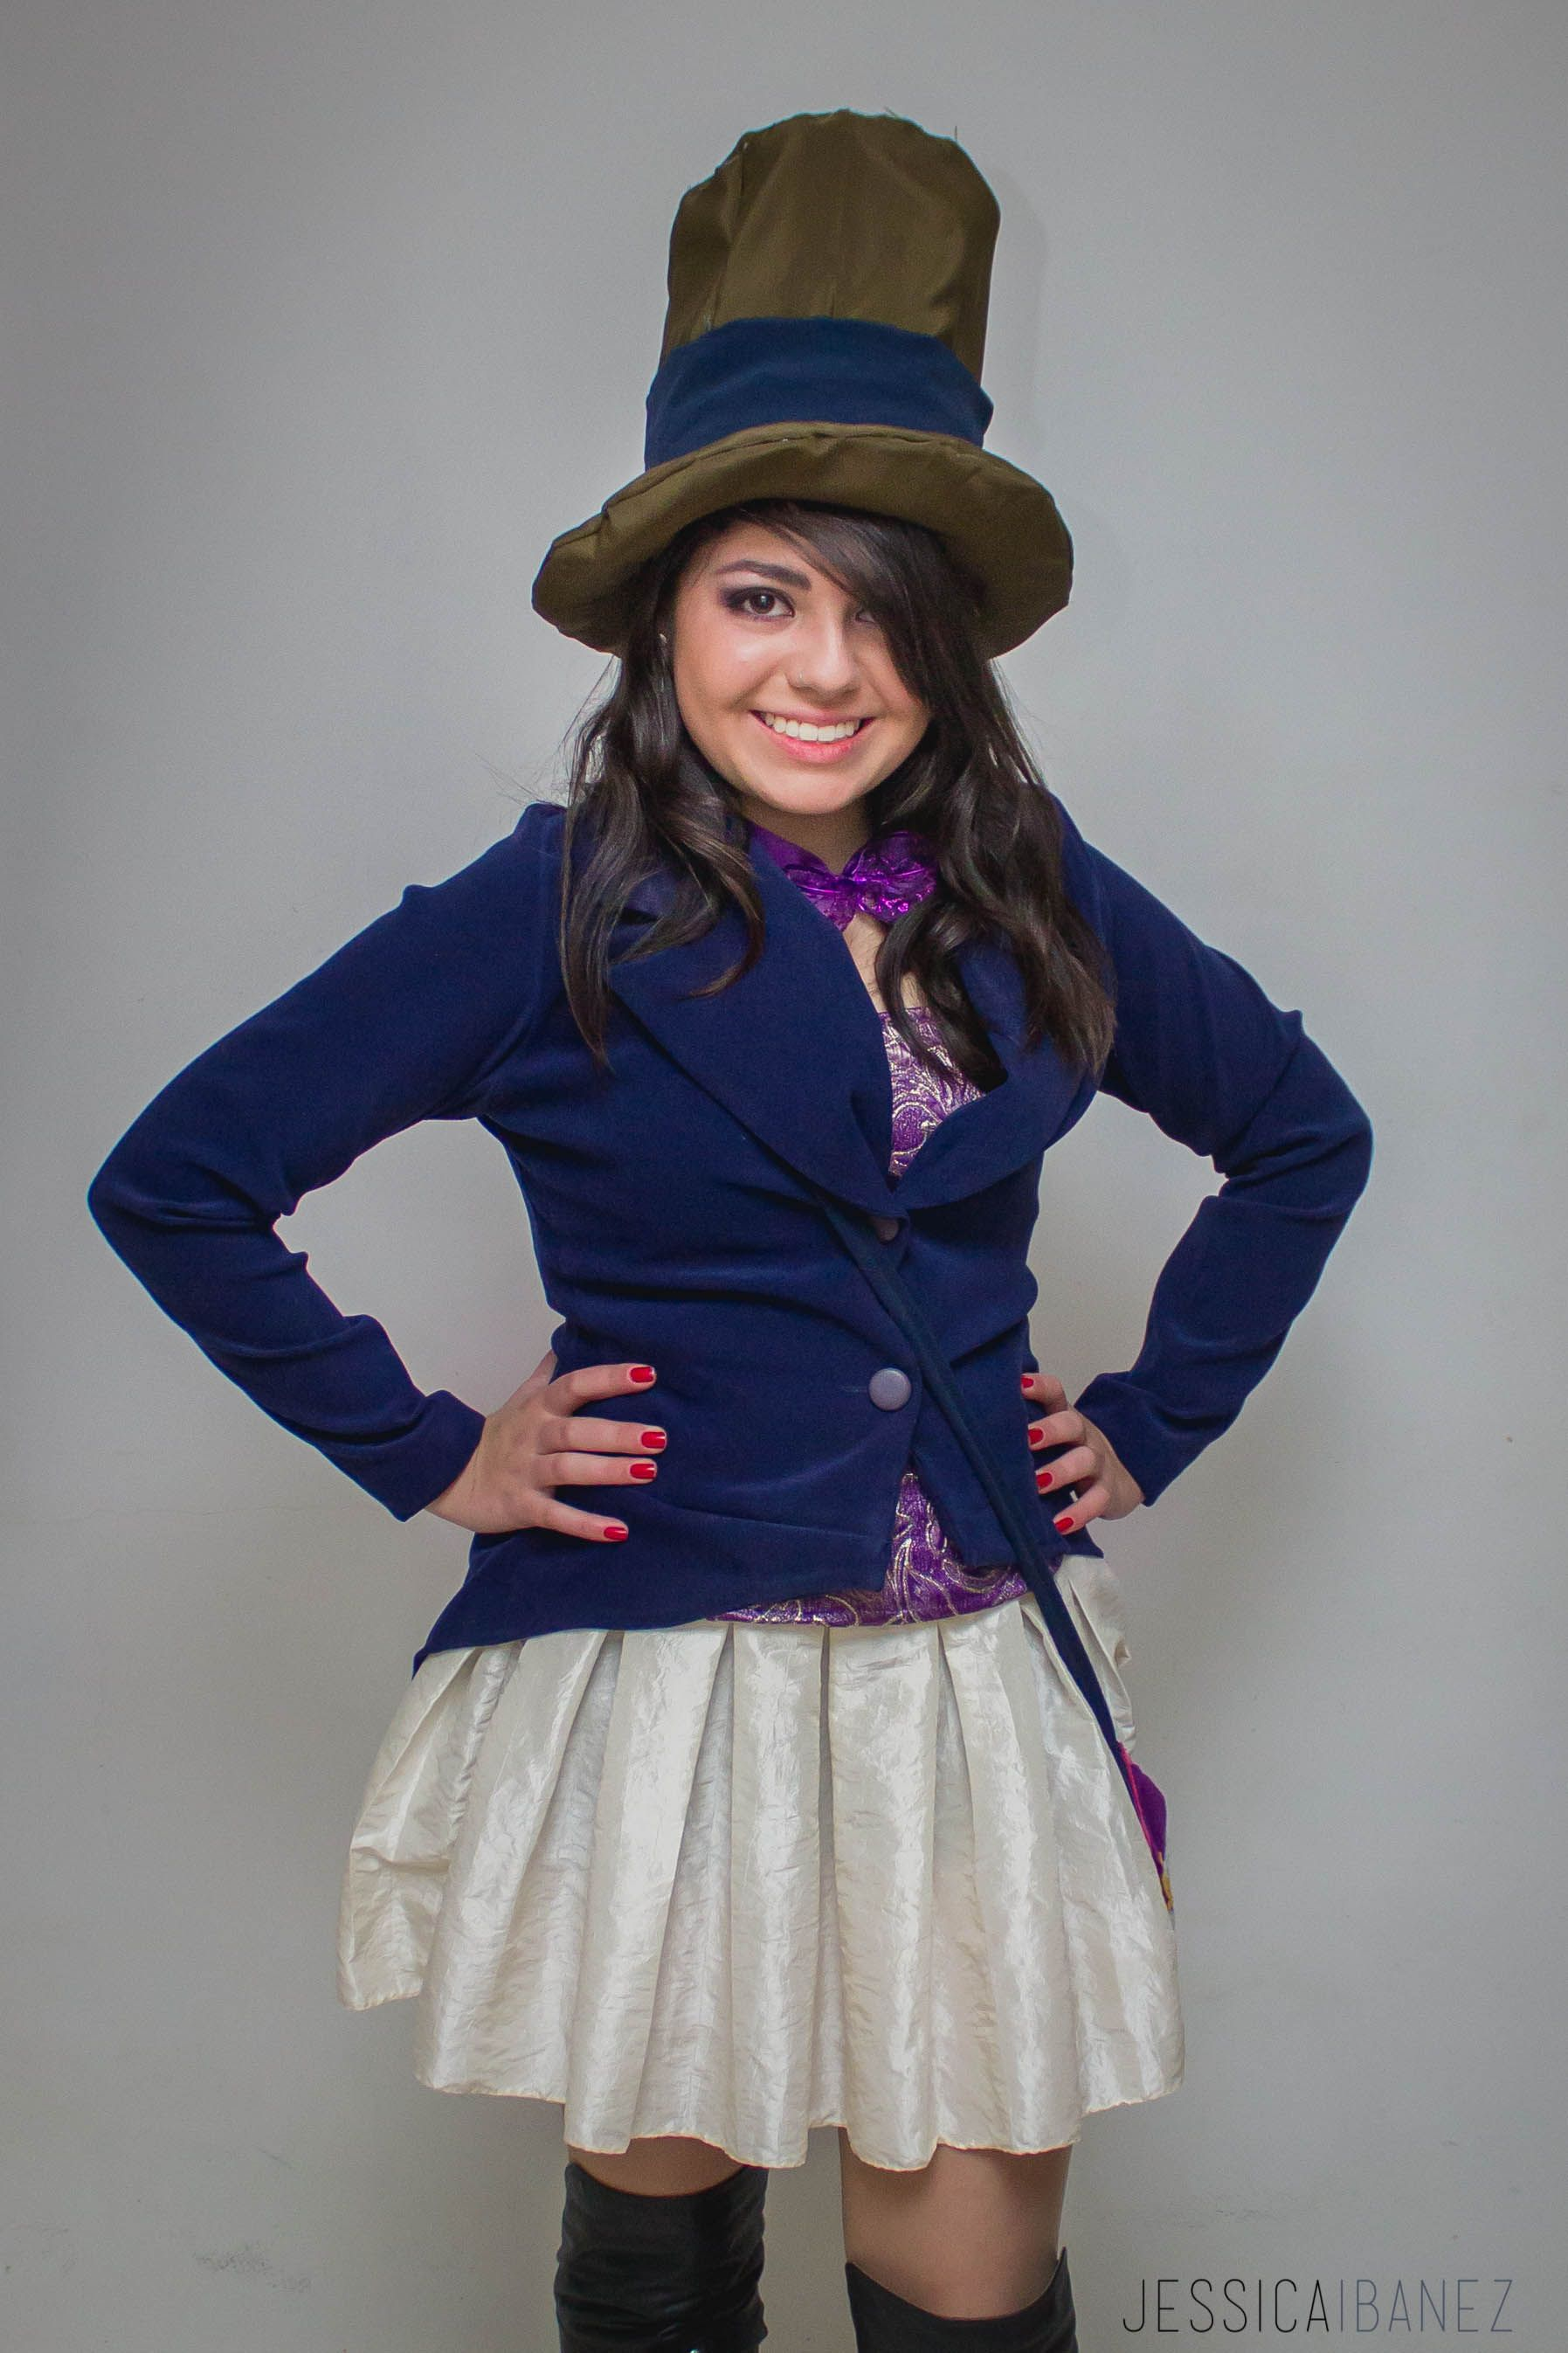 Willy Wonka Costume Woman. Hollowee